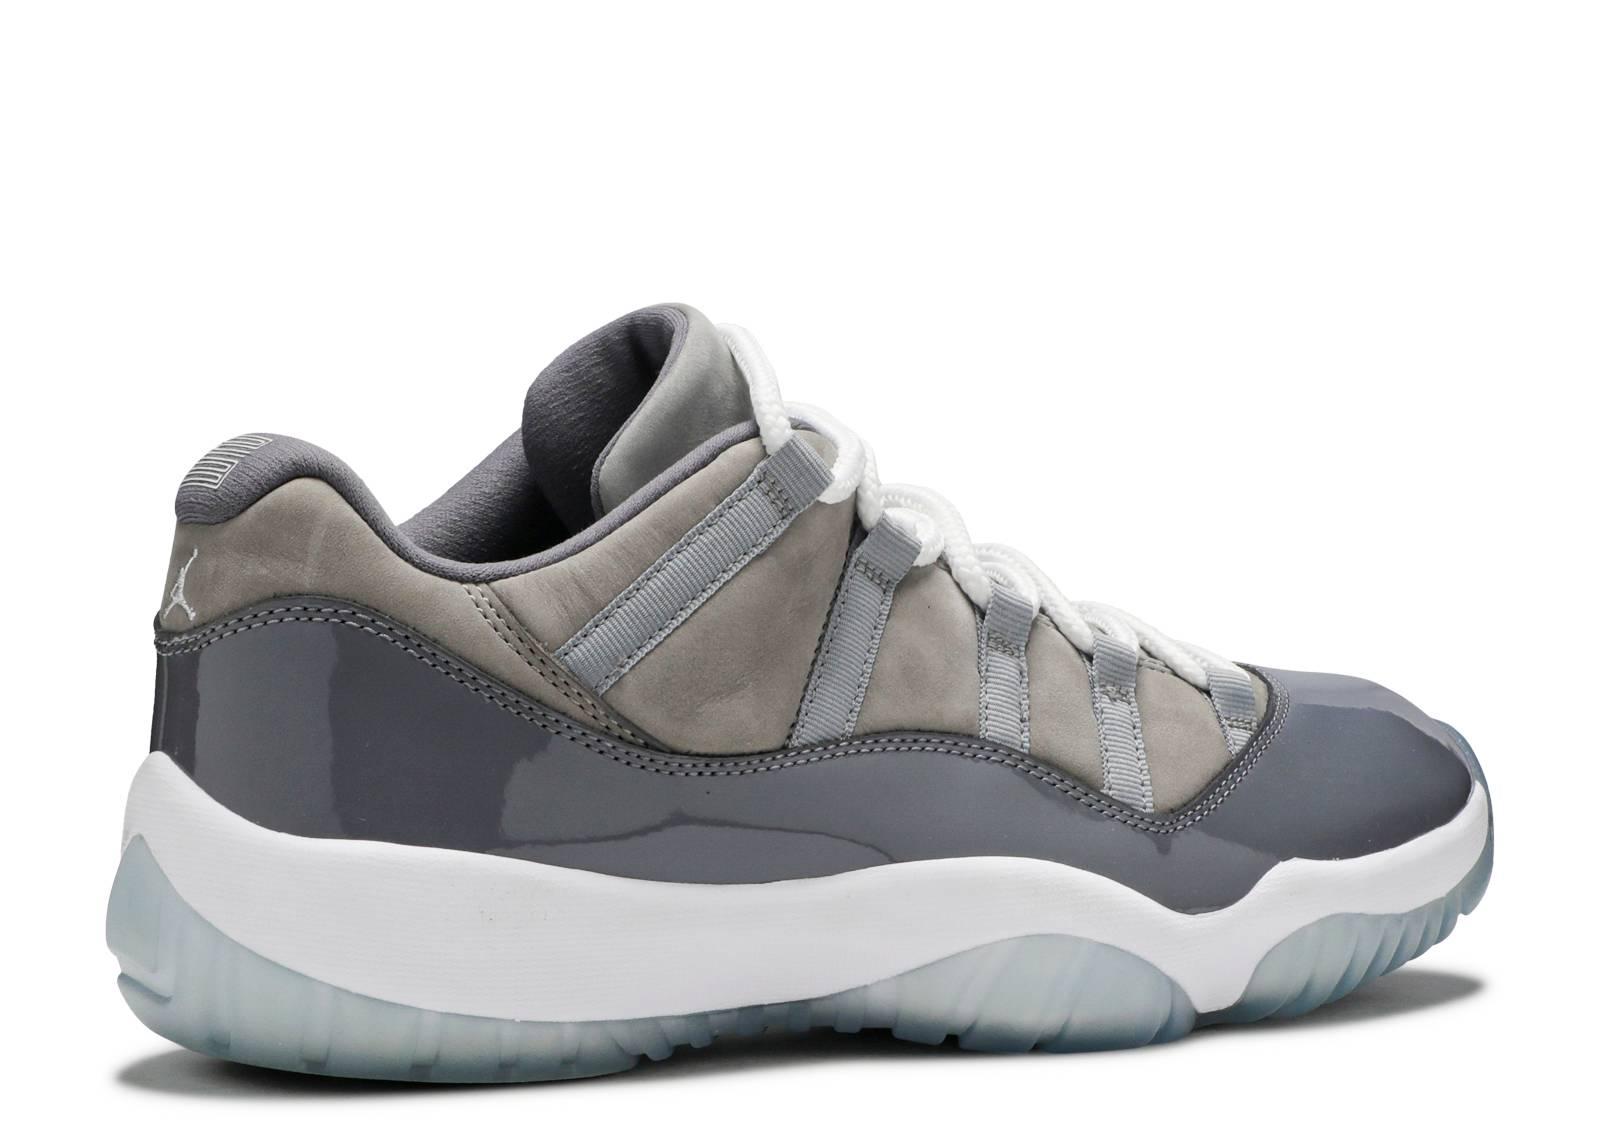 b3a6aea2baf6 Air Jordan 11 Retro Low